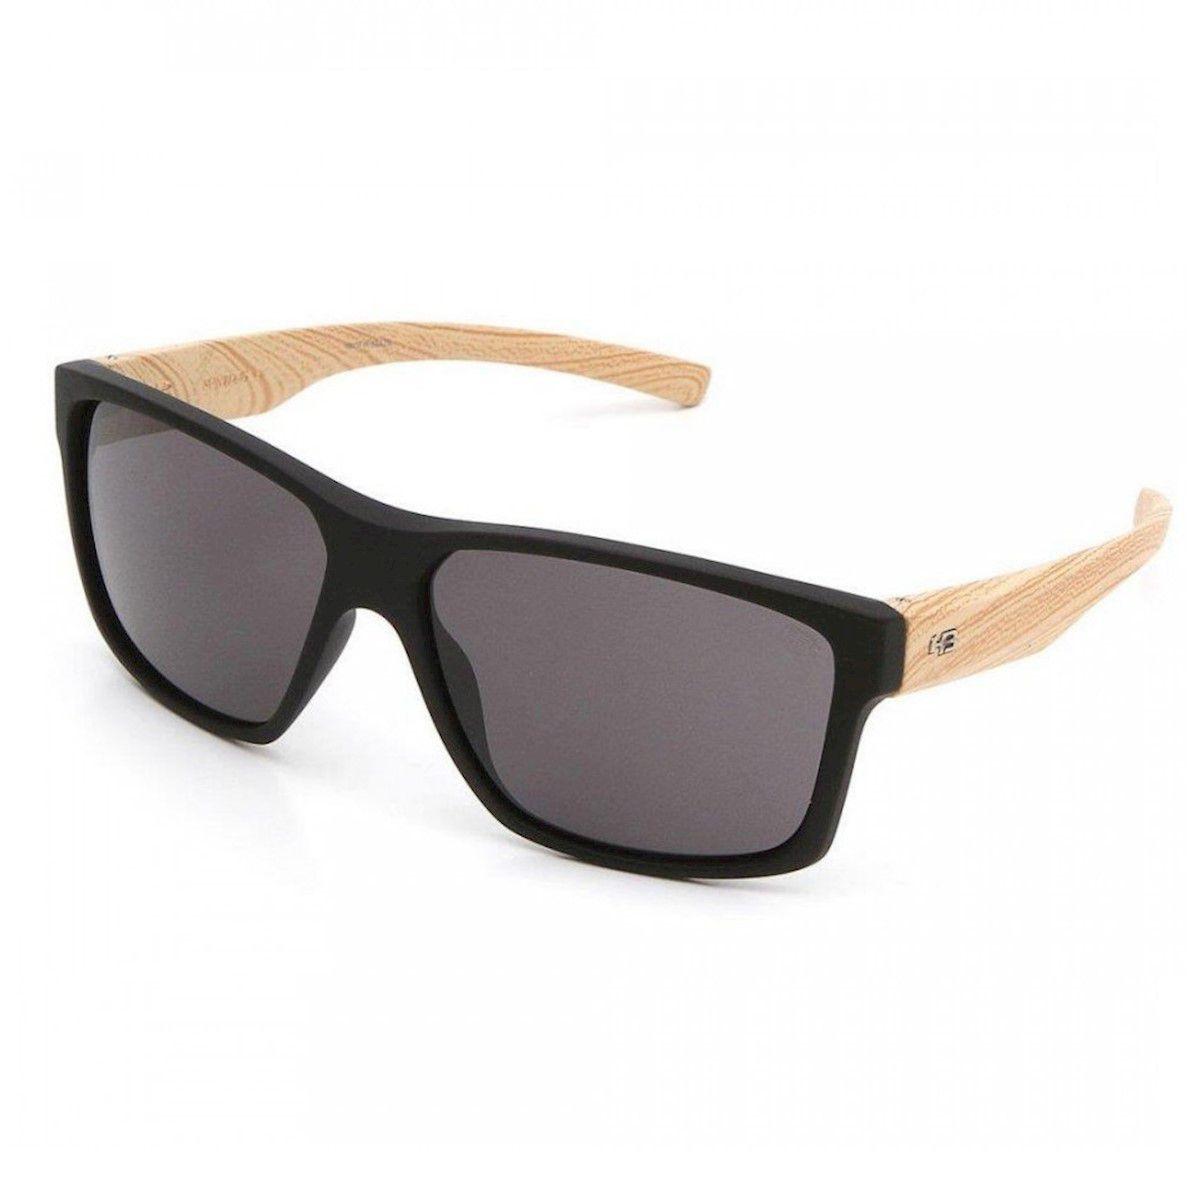 Óculos de Sol HB Freak Matte Lenses  Black Wood Gray